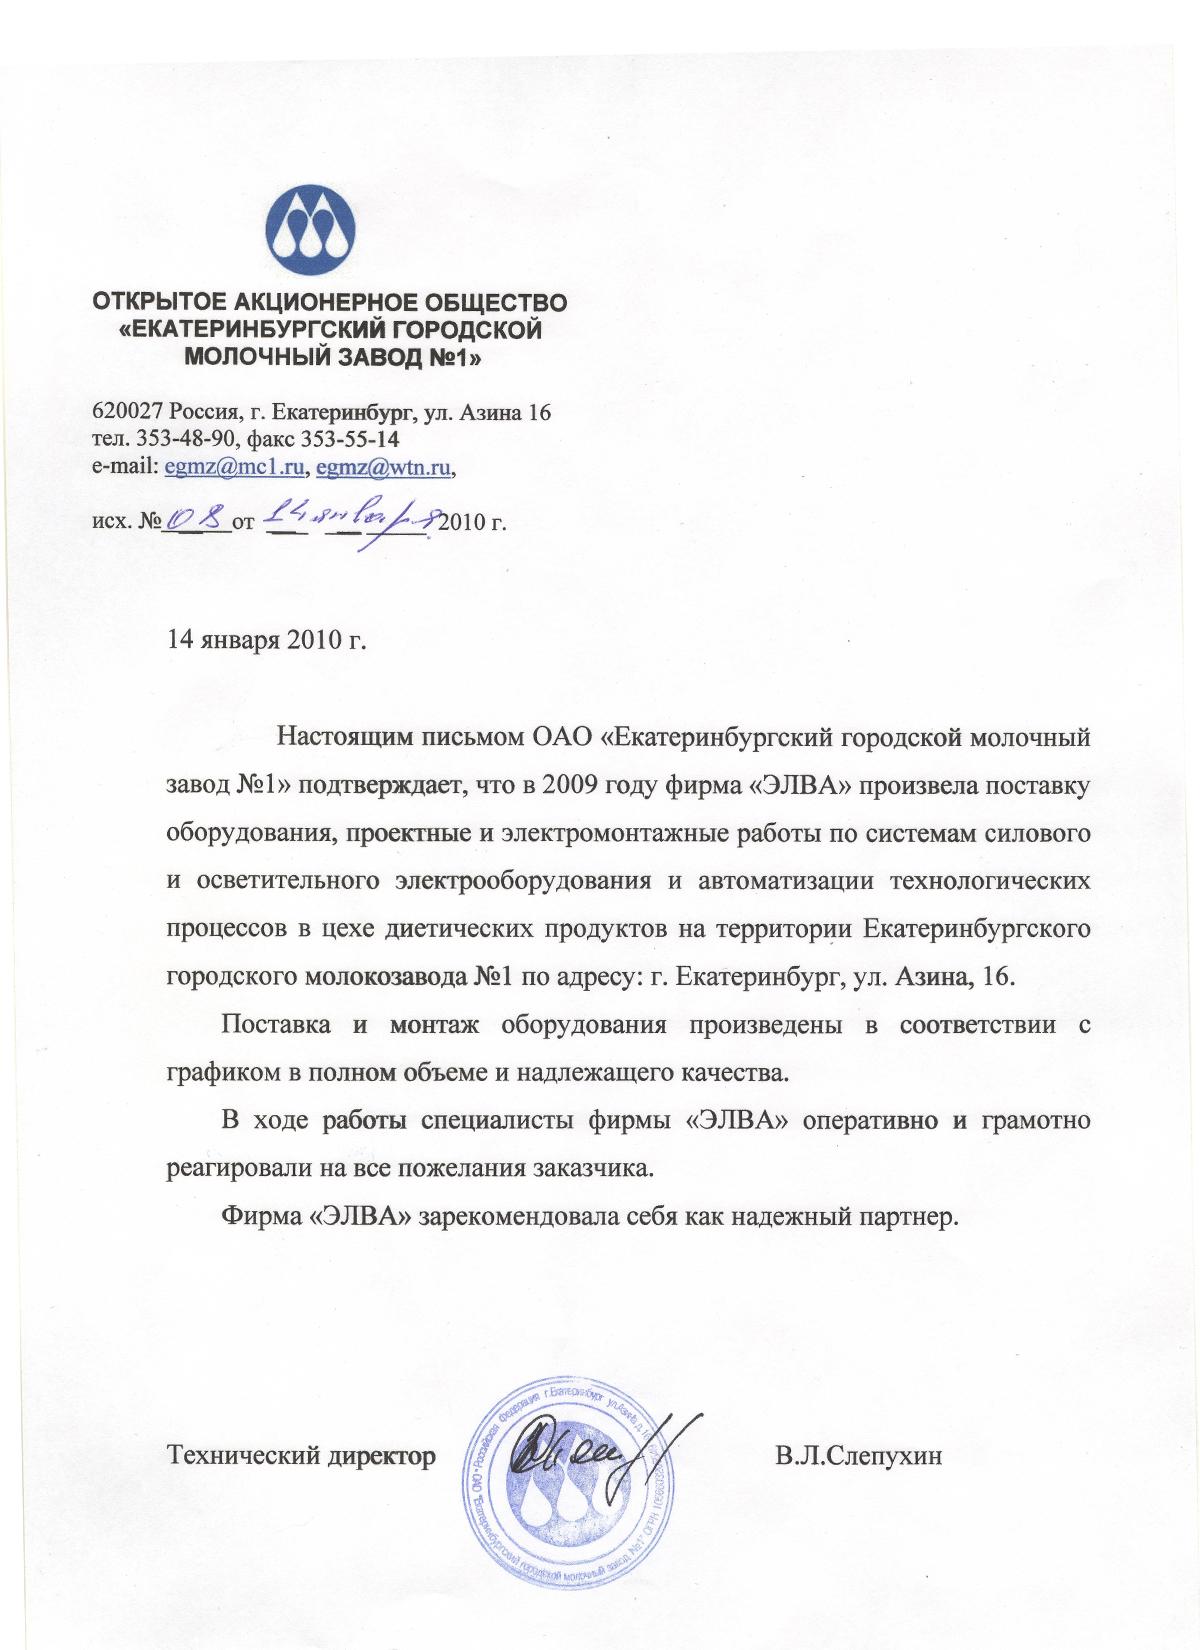 pismo-ot-egmz-1_2